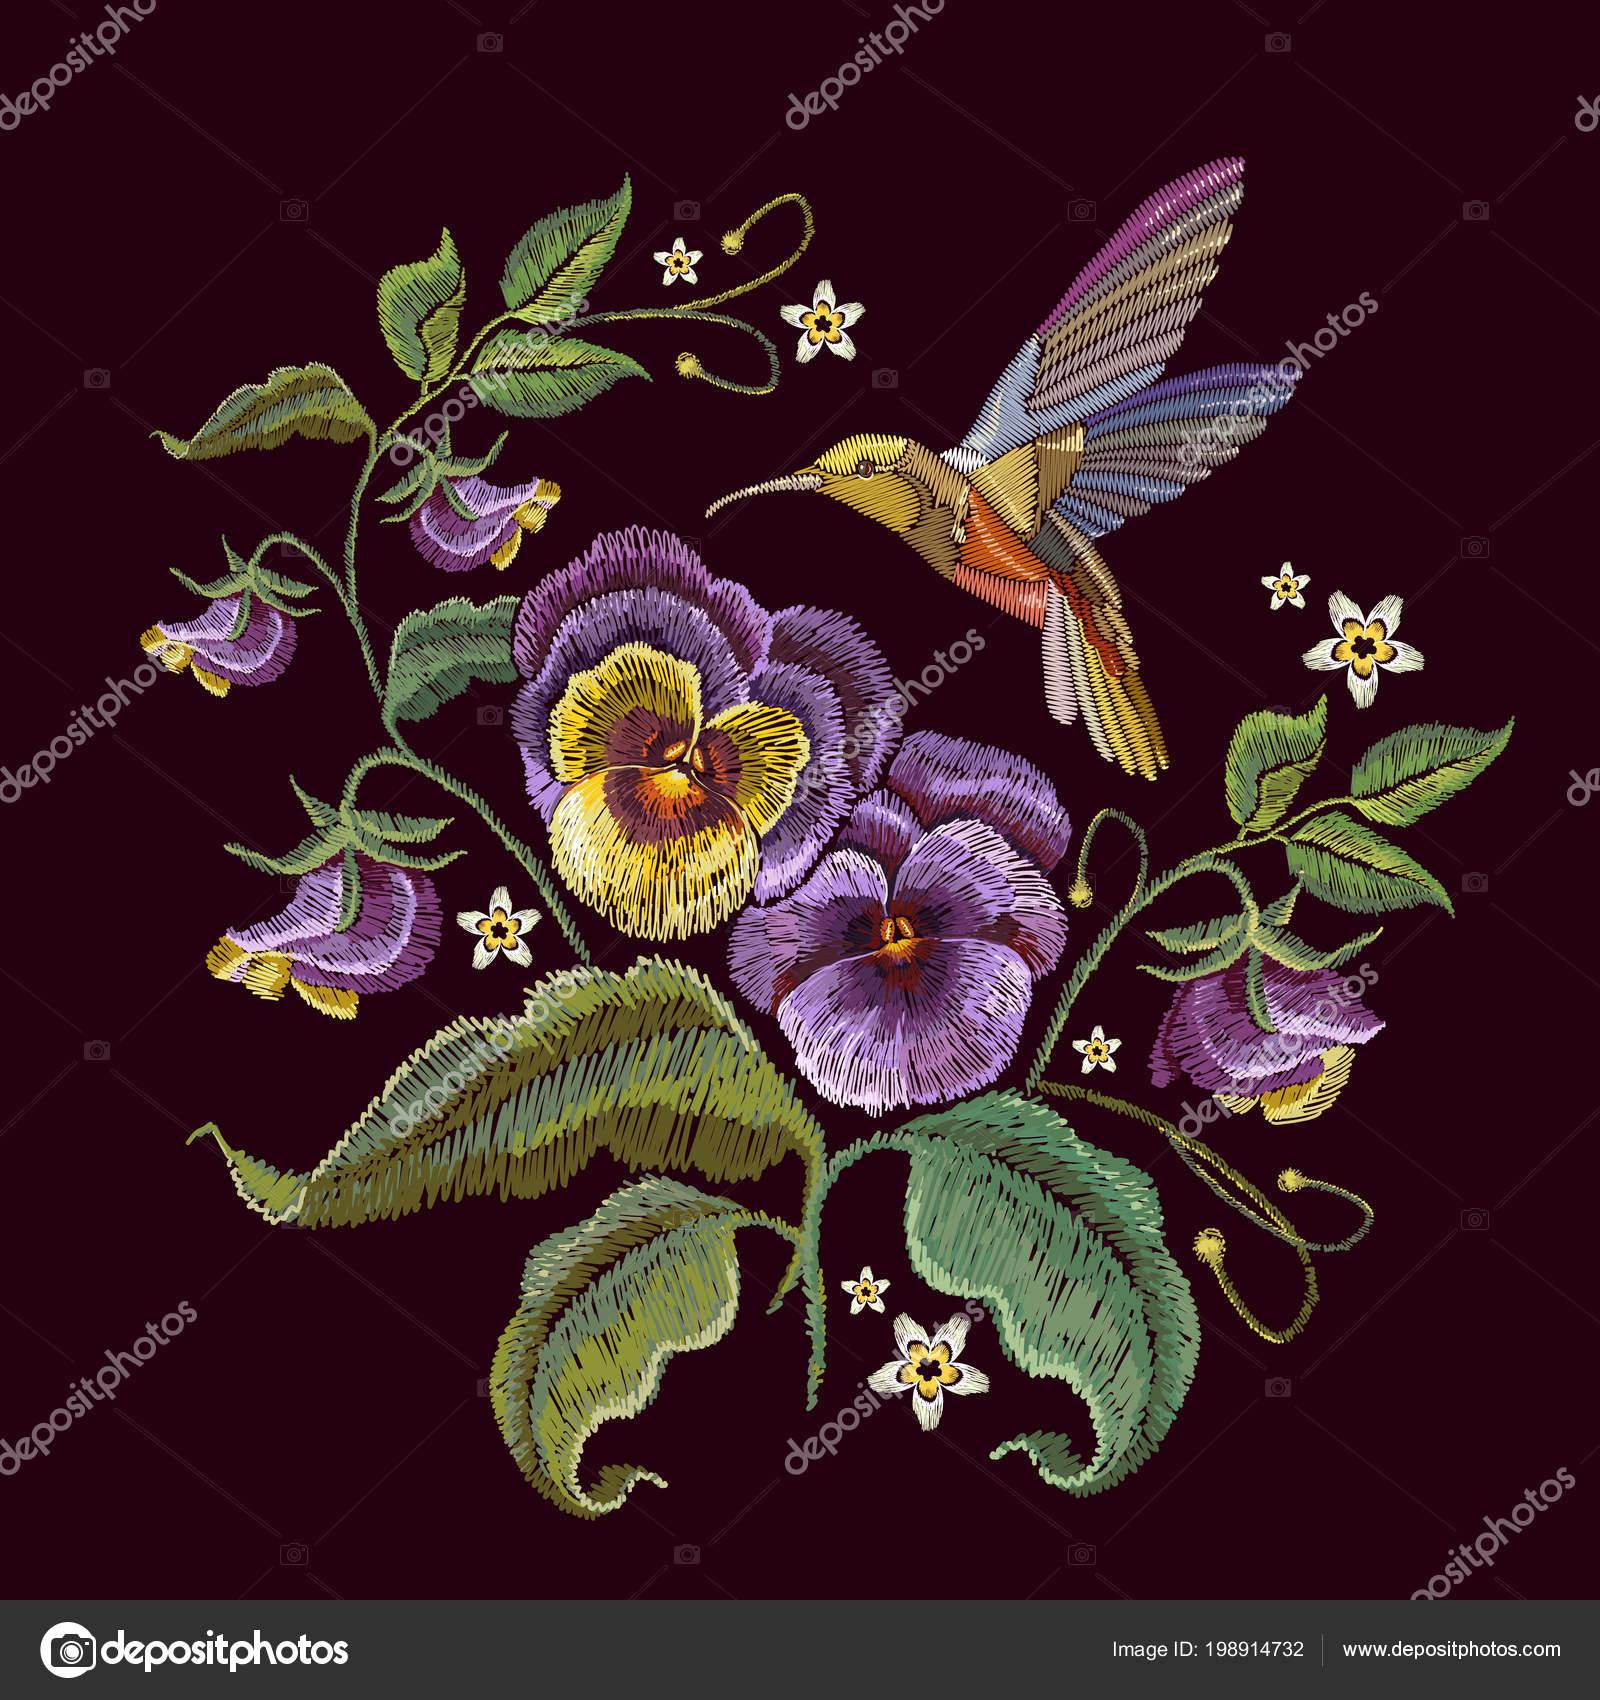 Violets Flower Humming Bird Embroidery Fashionable Design Clothes Shirt Design Stock Vector C Matriyoshka 198914732